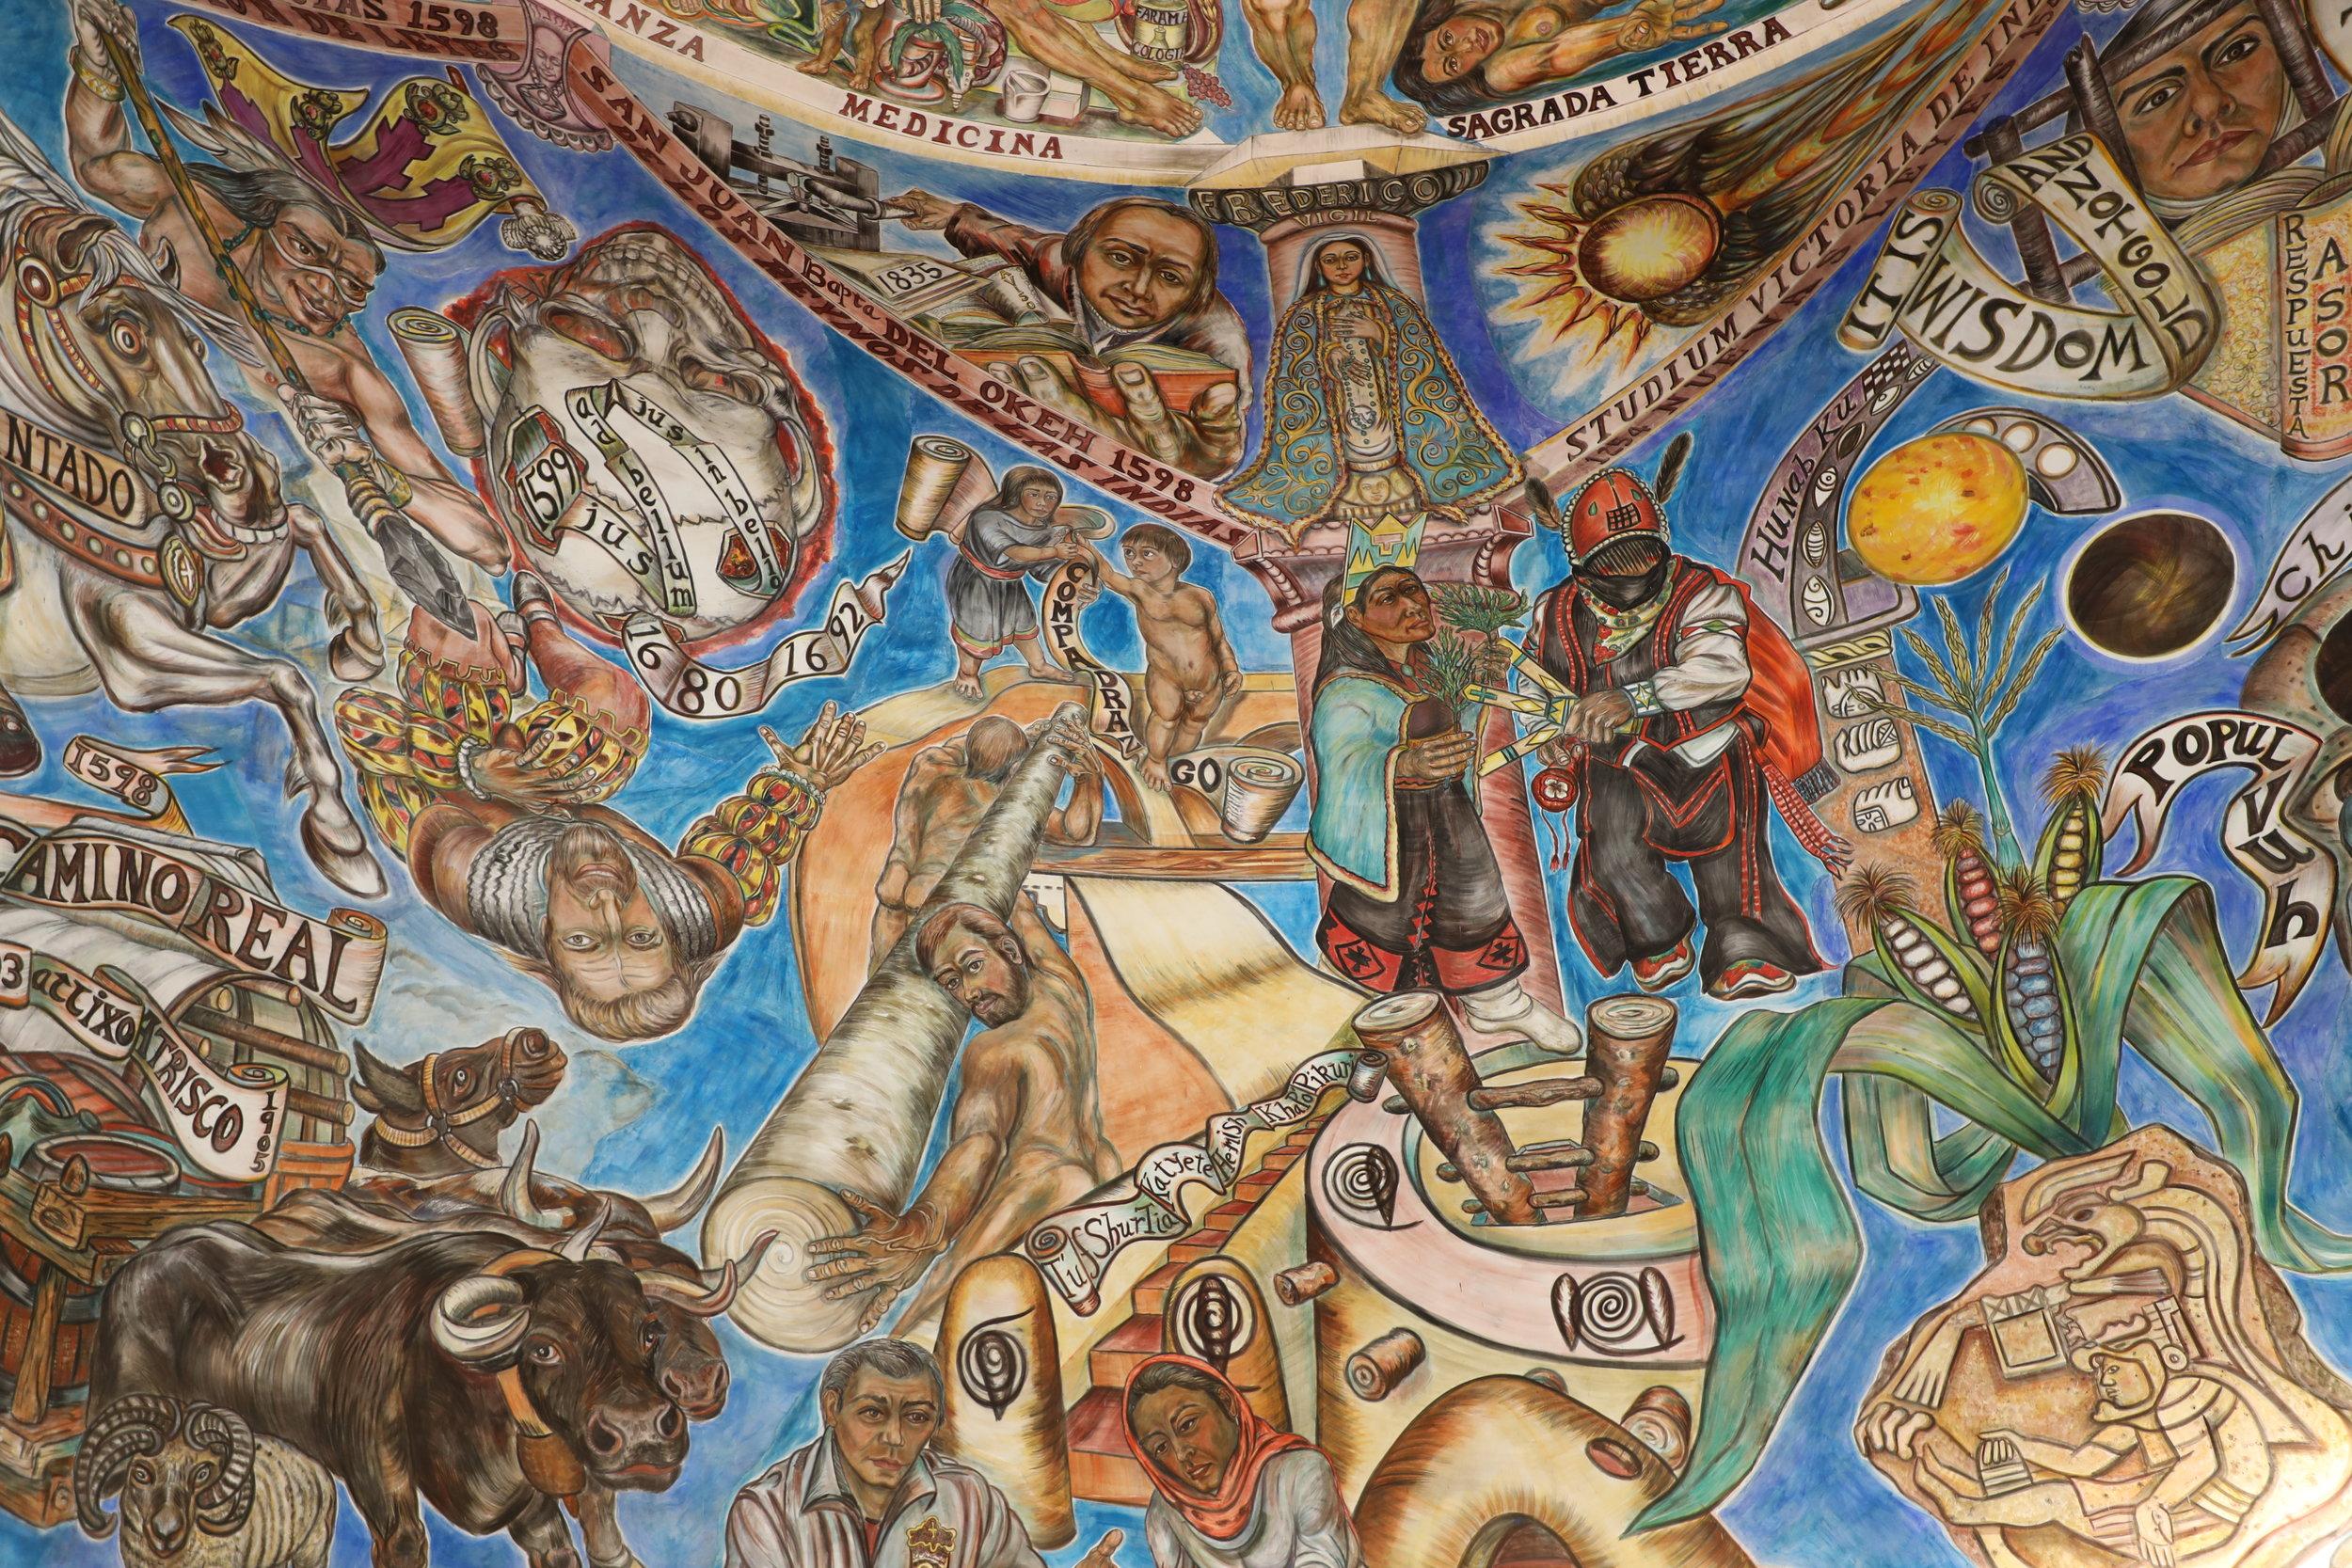 A fresco painted by Frederico Vigil.